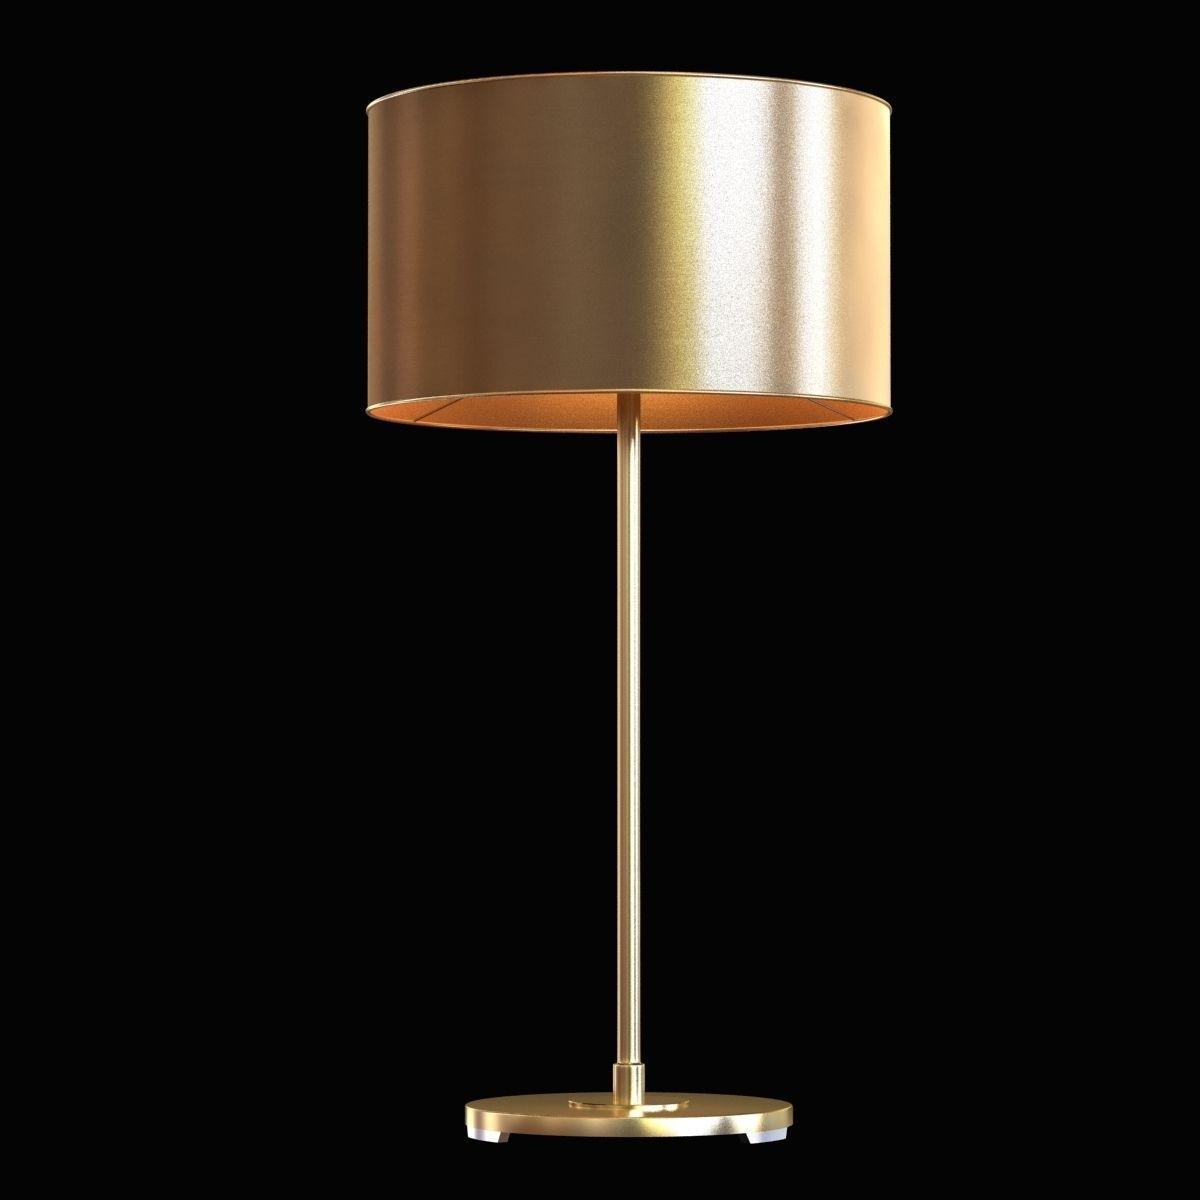 Restoration Hardware Antiqued Metal Drum Table Lamp 3d Model Max Obj